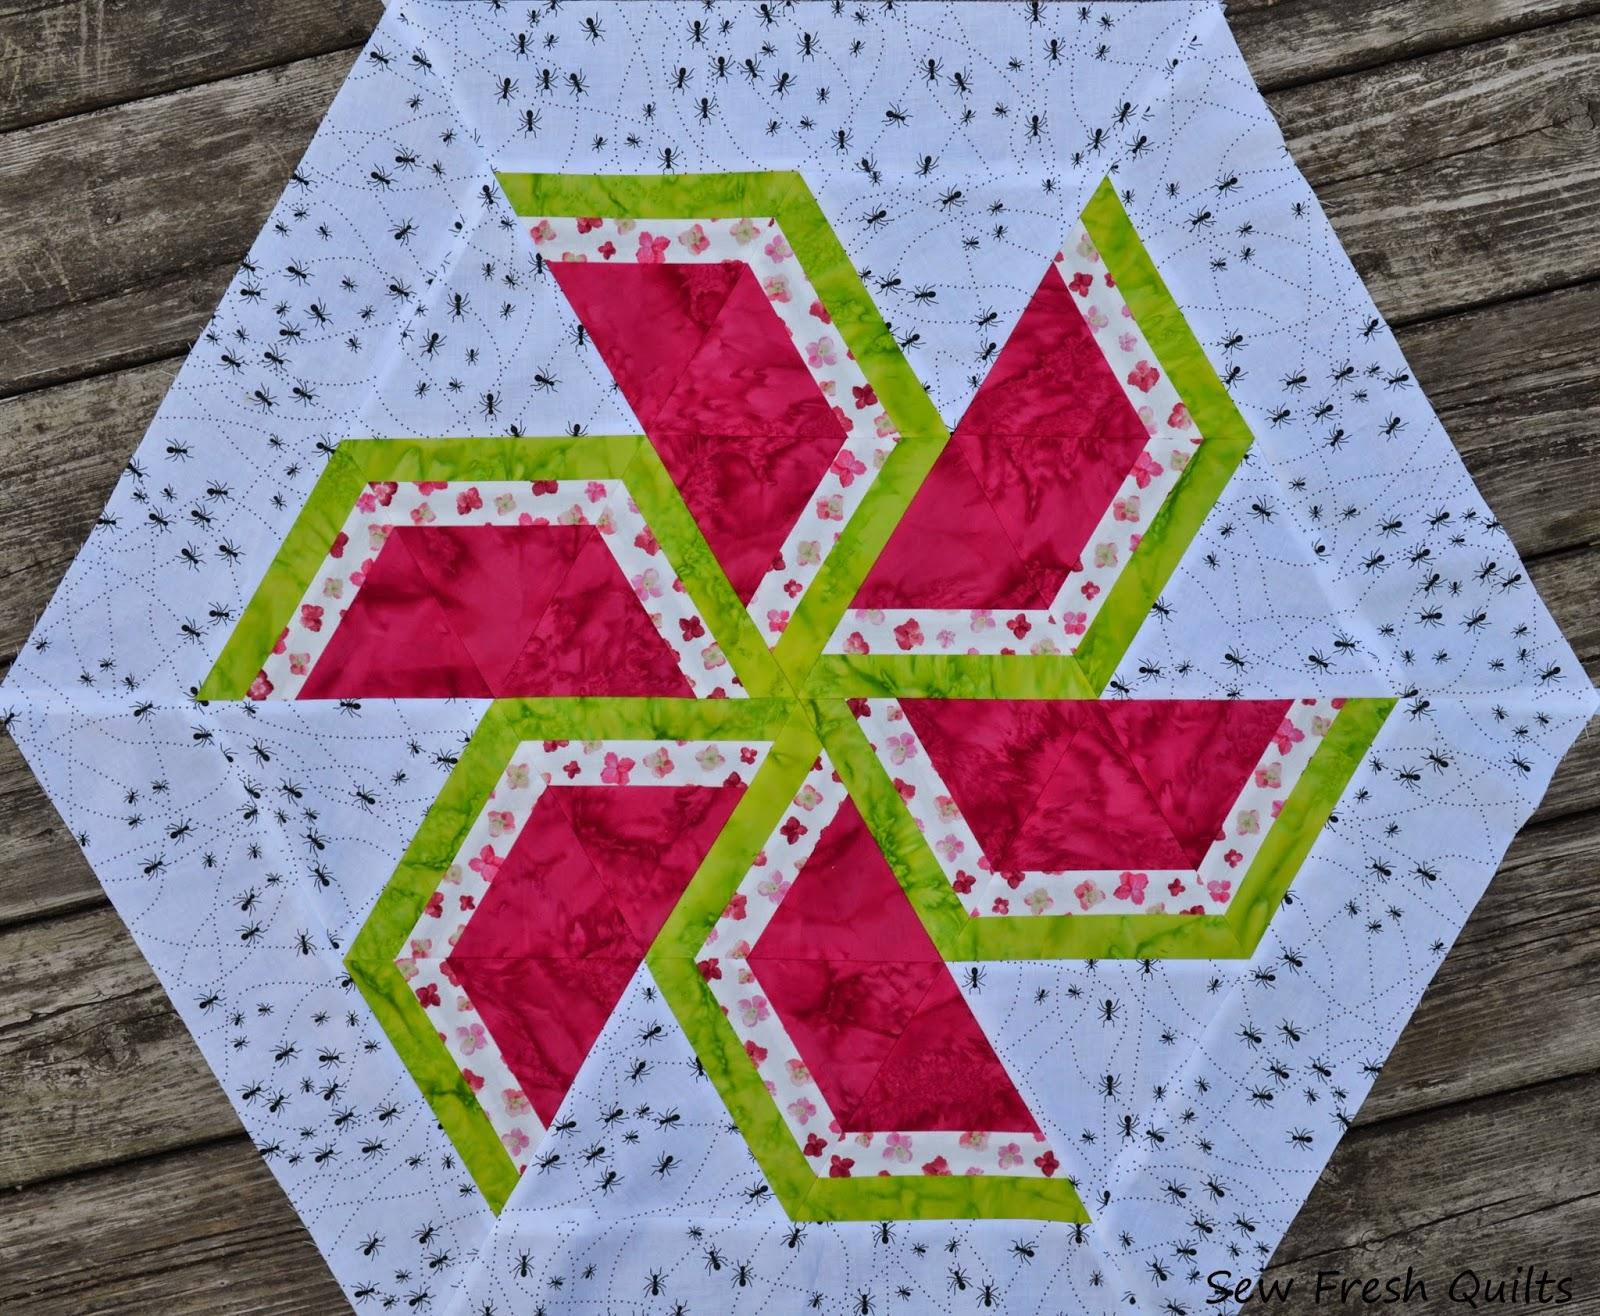 Sew Fresh Quilts: Sweet Watermelons! : watermelon quilt - Adamdwight.com